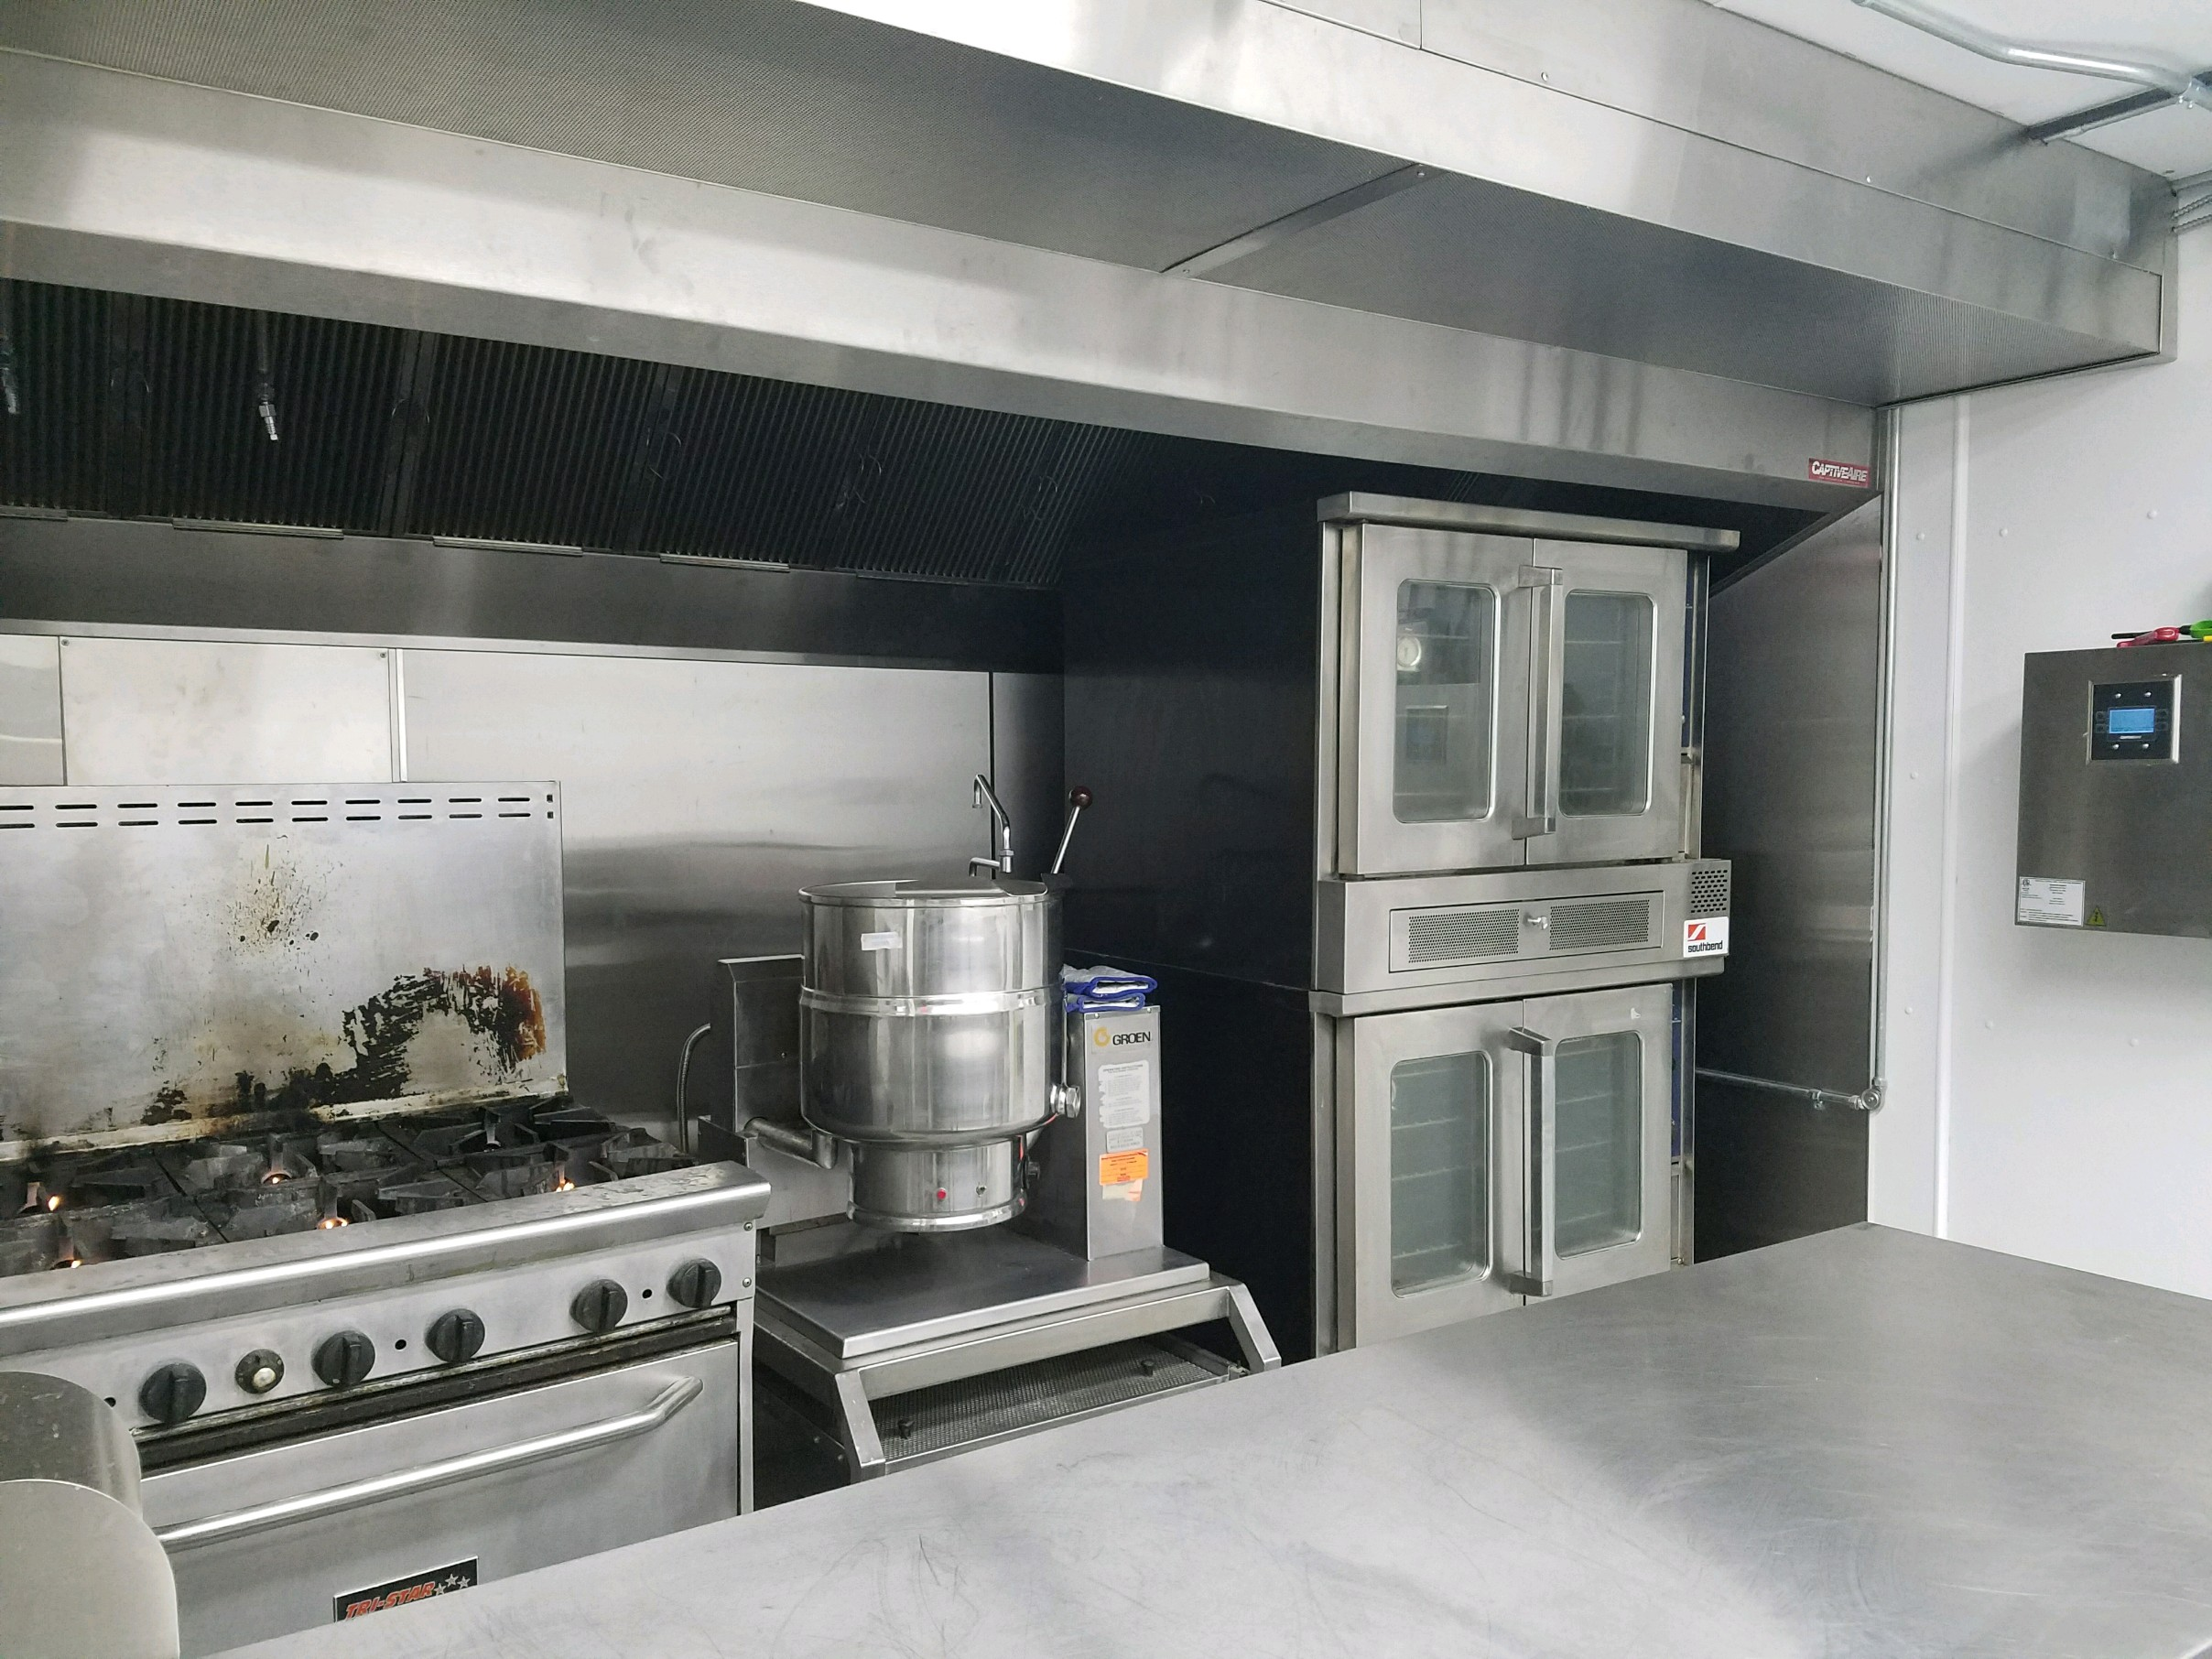 Growing Hope Incubator Kitchen